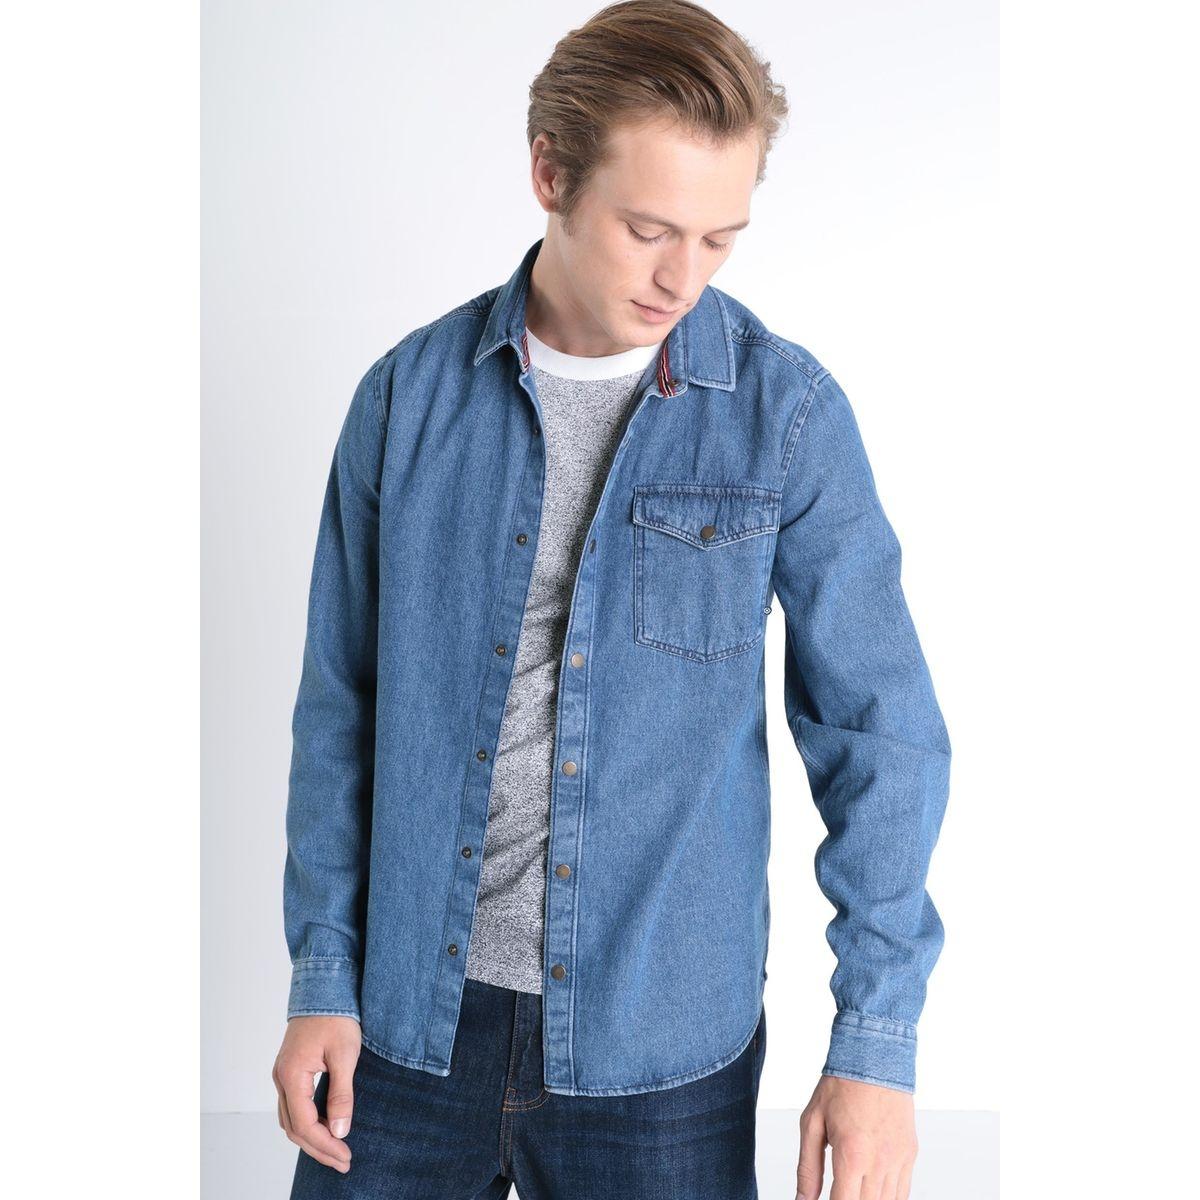 Chemise manches longues jean